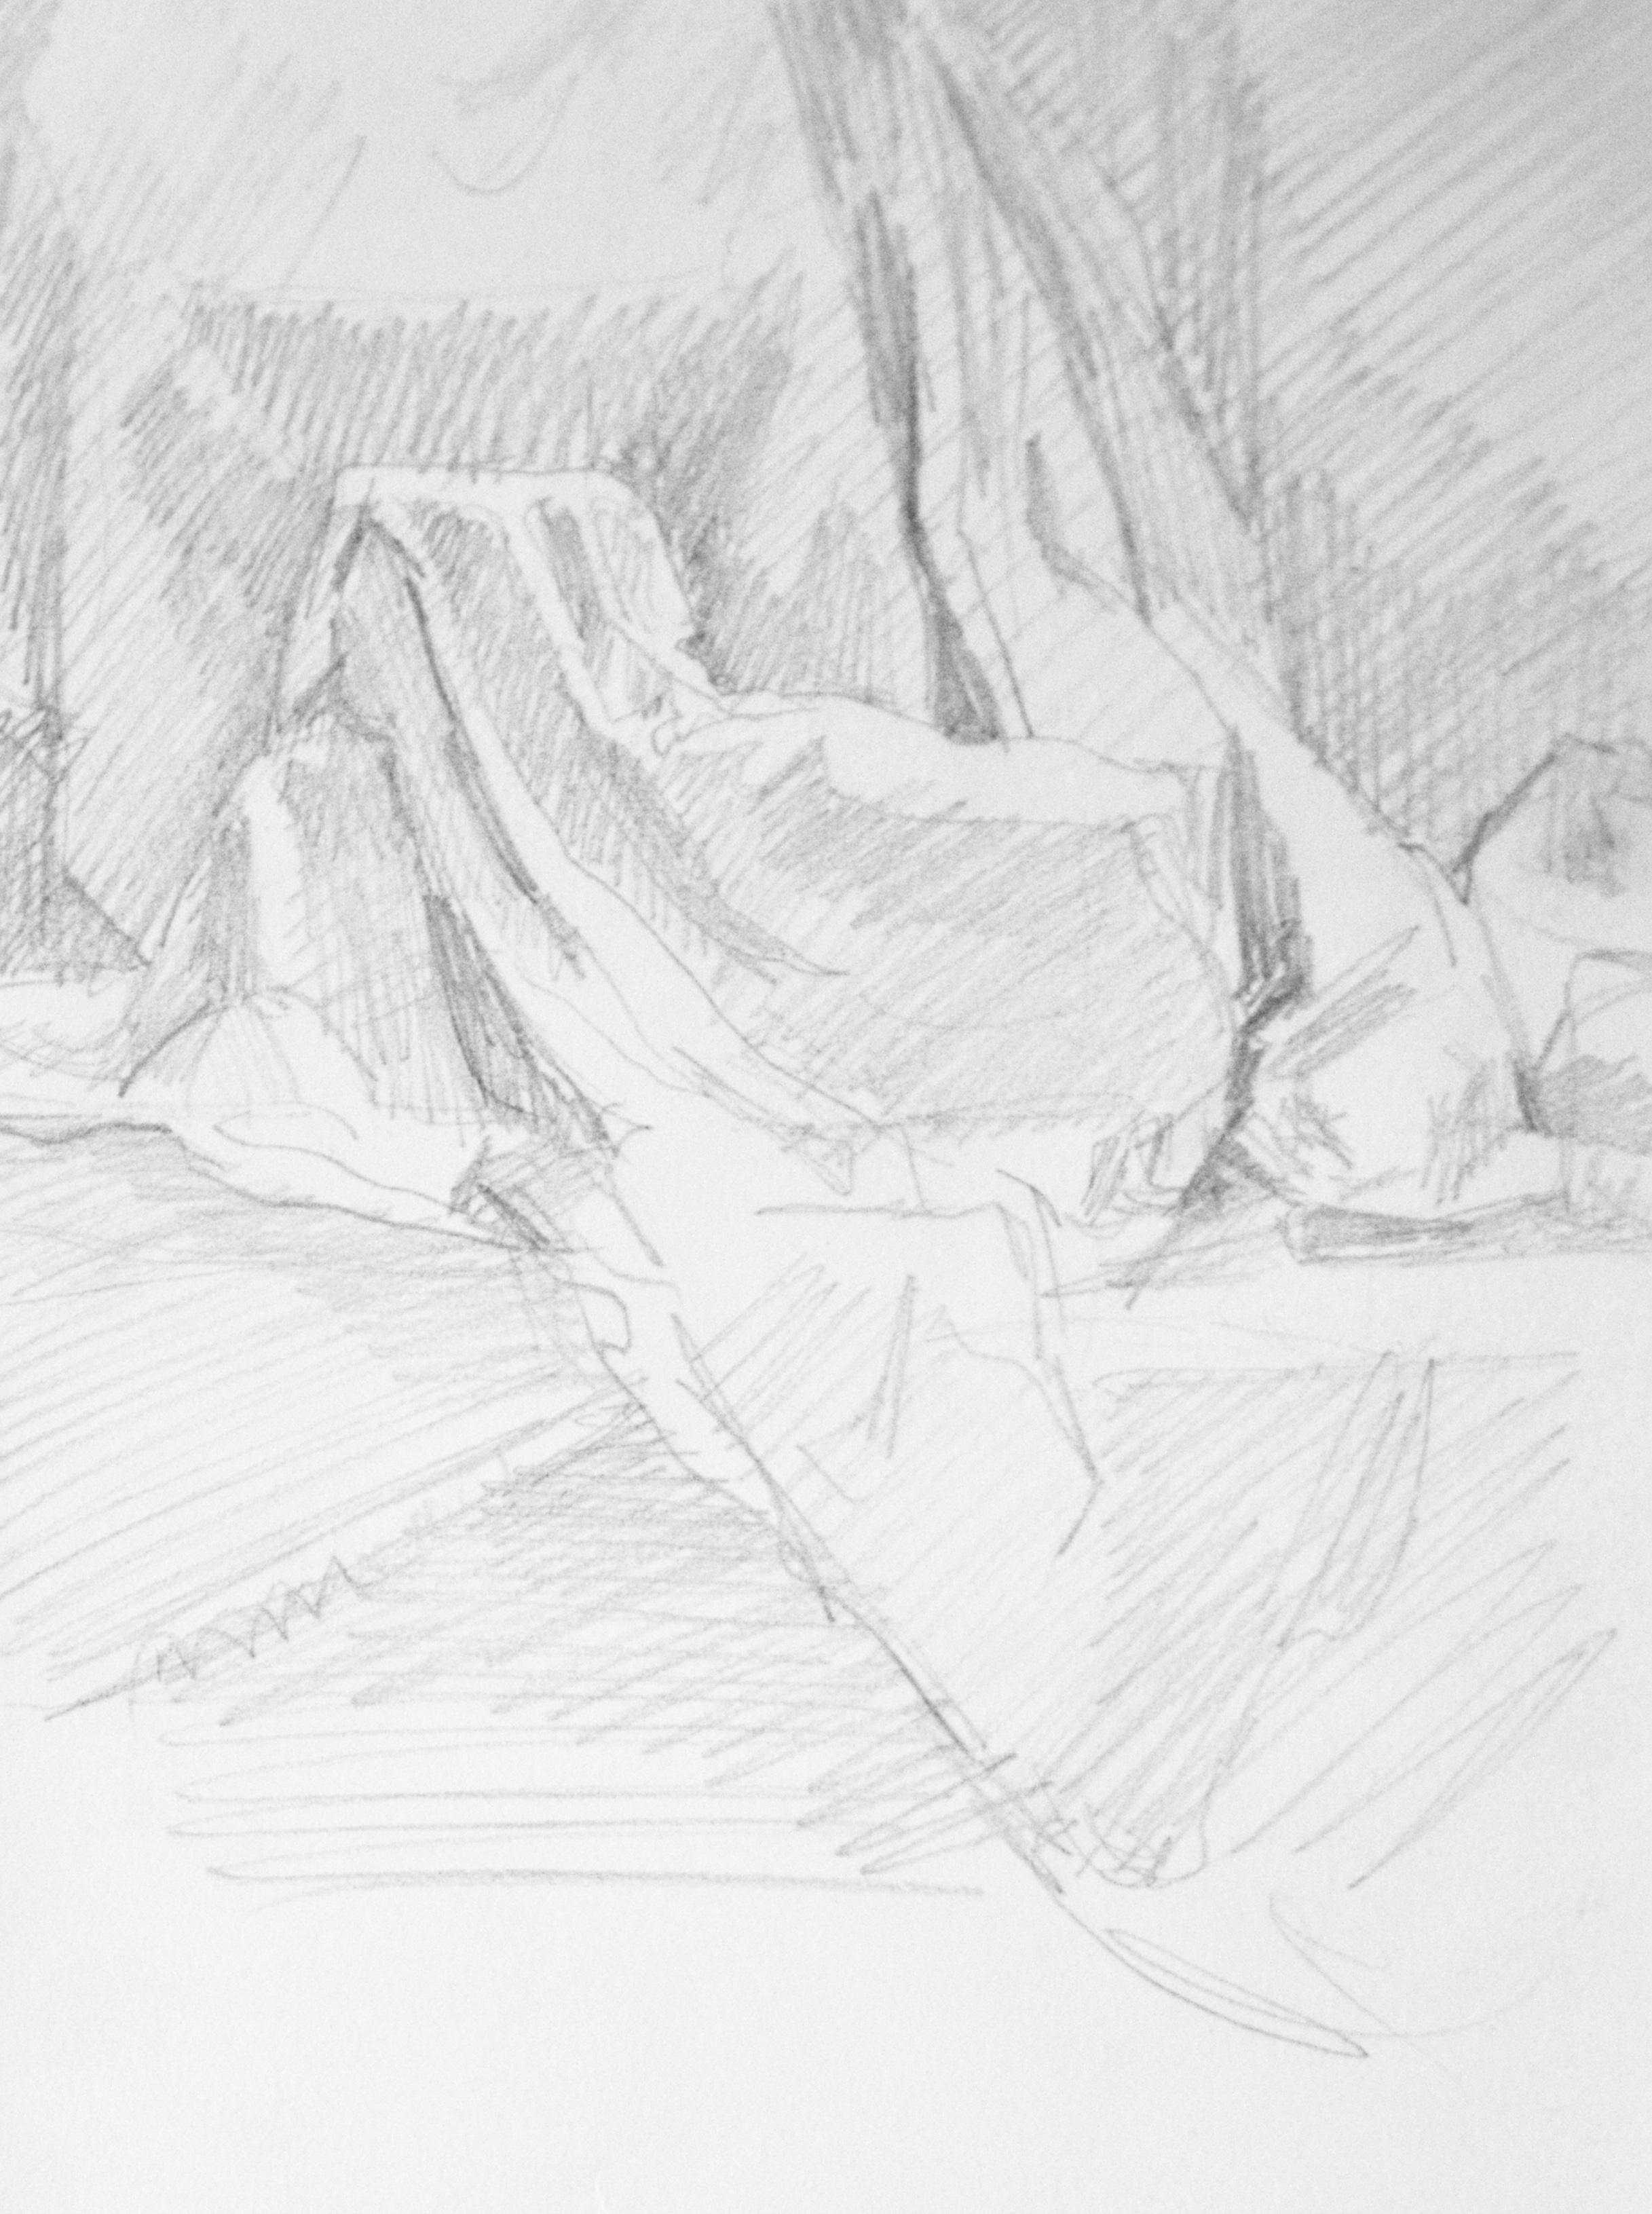 Drapery Study,   2017  Graphite on paper